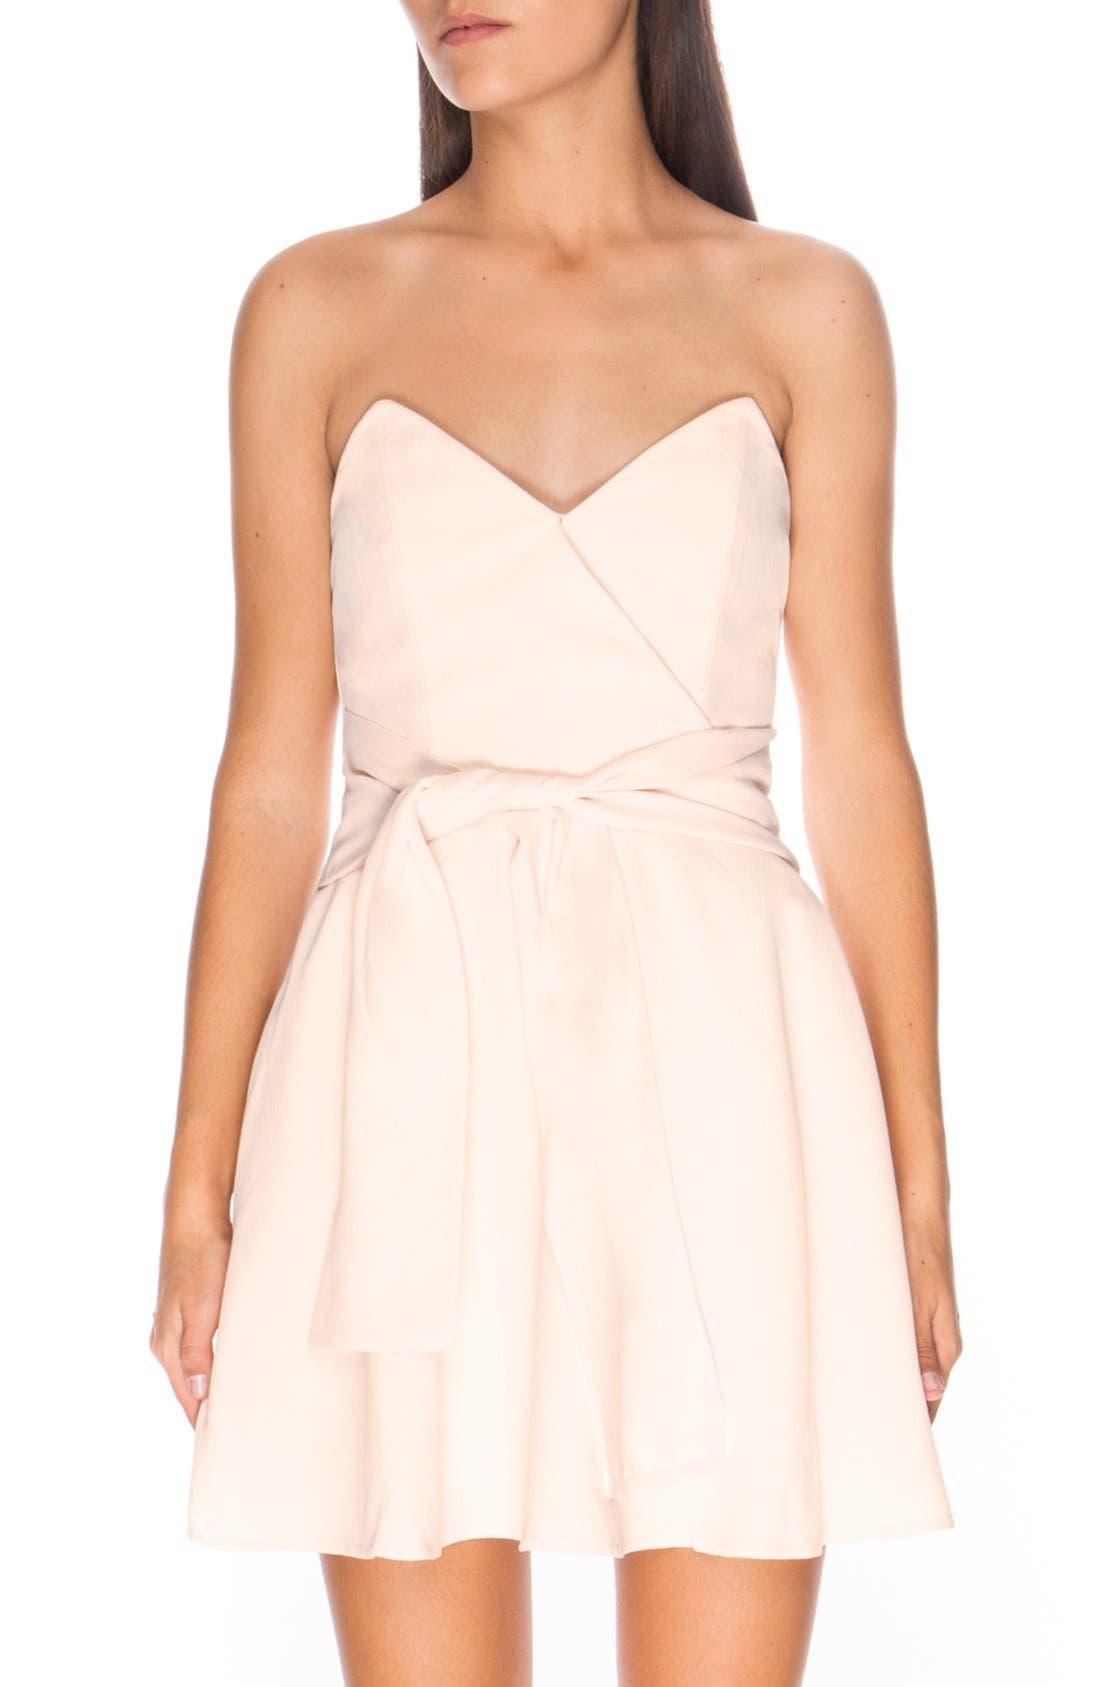 Main Image - Keepsake the Label 'Get Free' Strapless Minidress